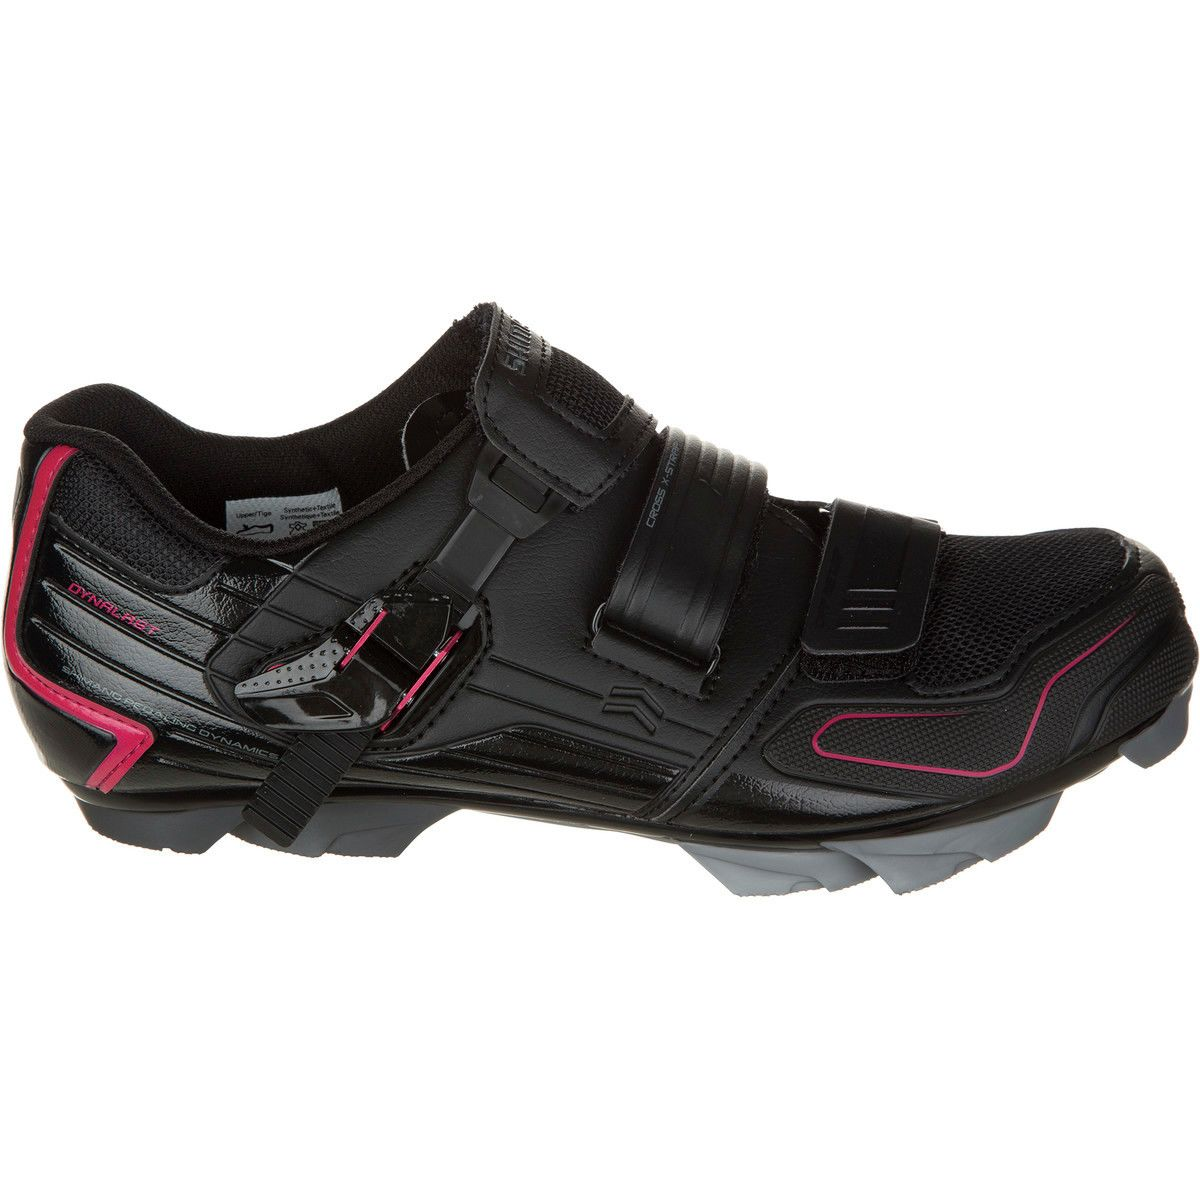 Dhb T  Triathlon Cycling Shoe Review